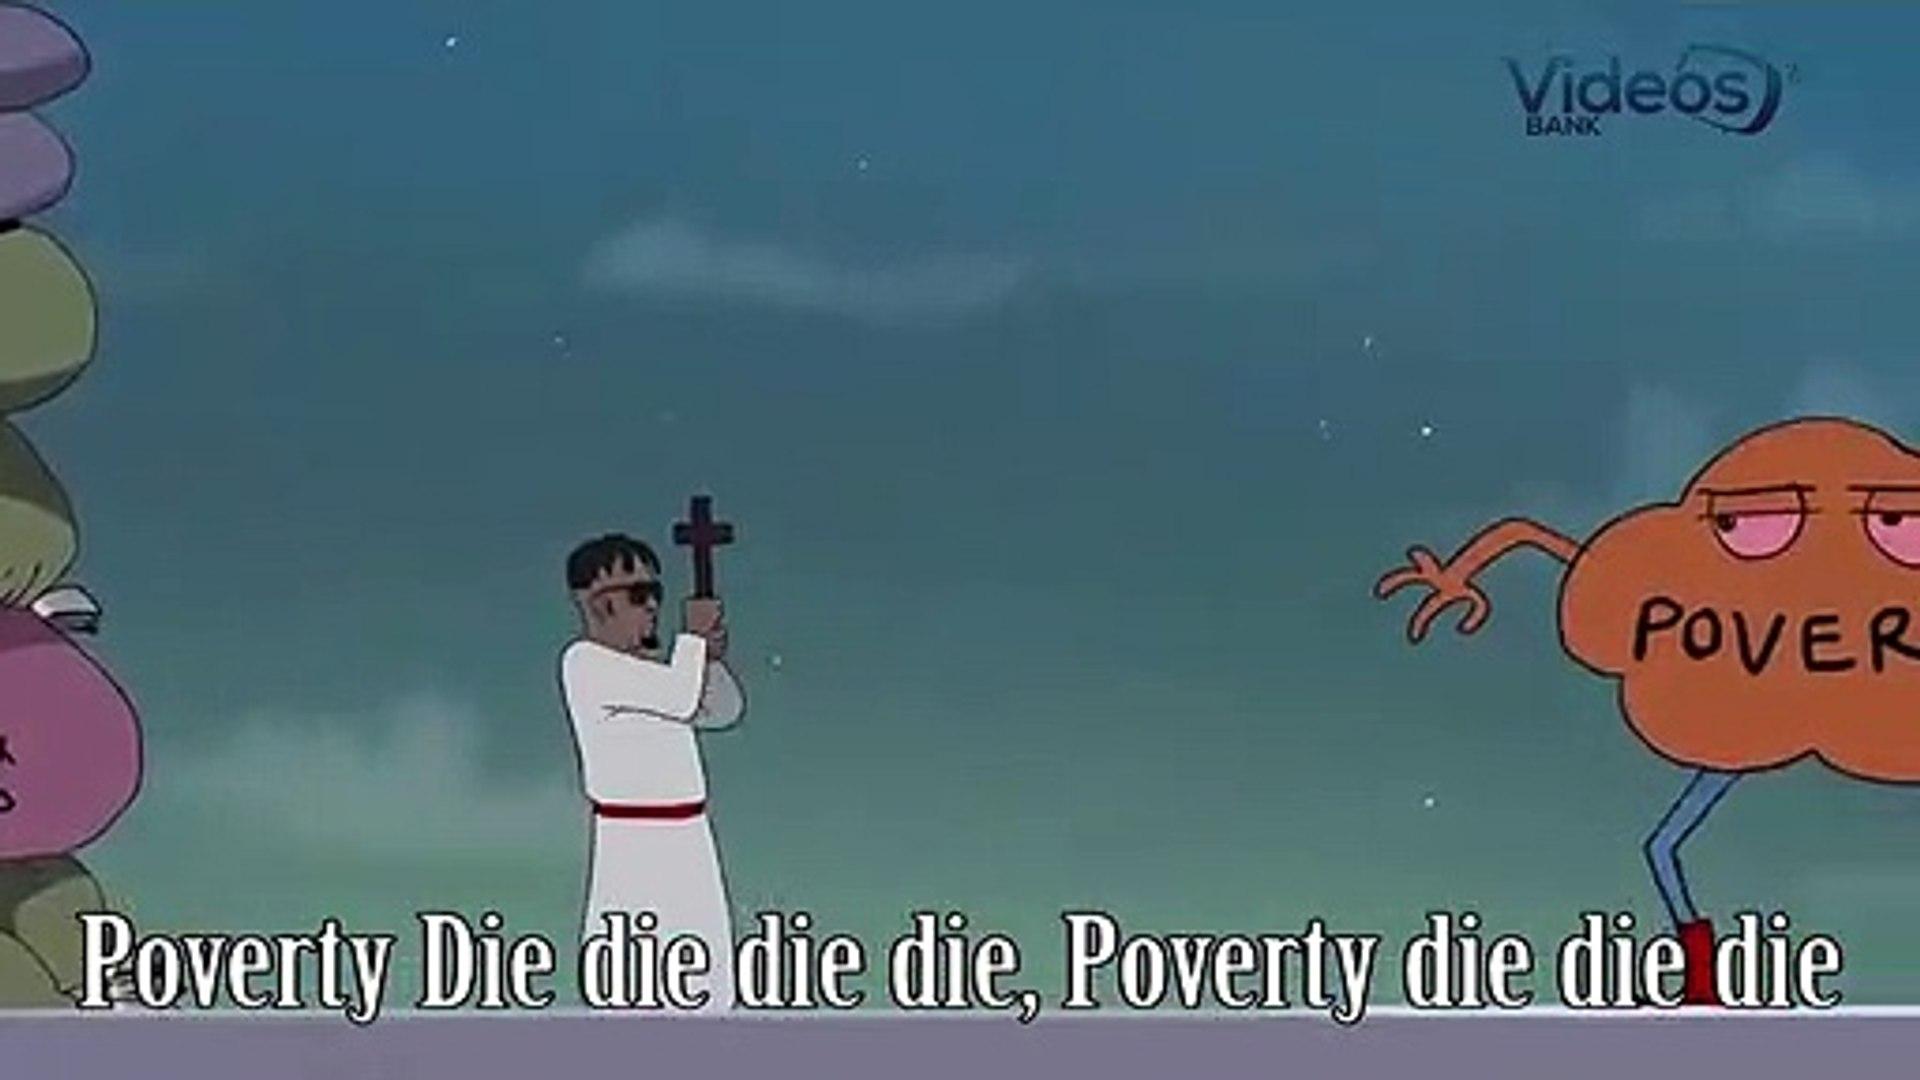 OLAMIDE - POVERTY DIE ( VIDEOS WITH LYRICS)